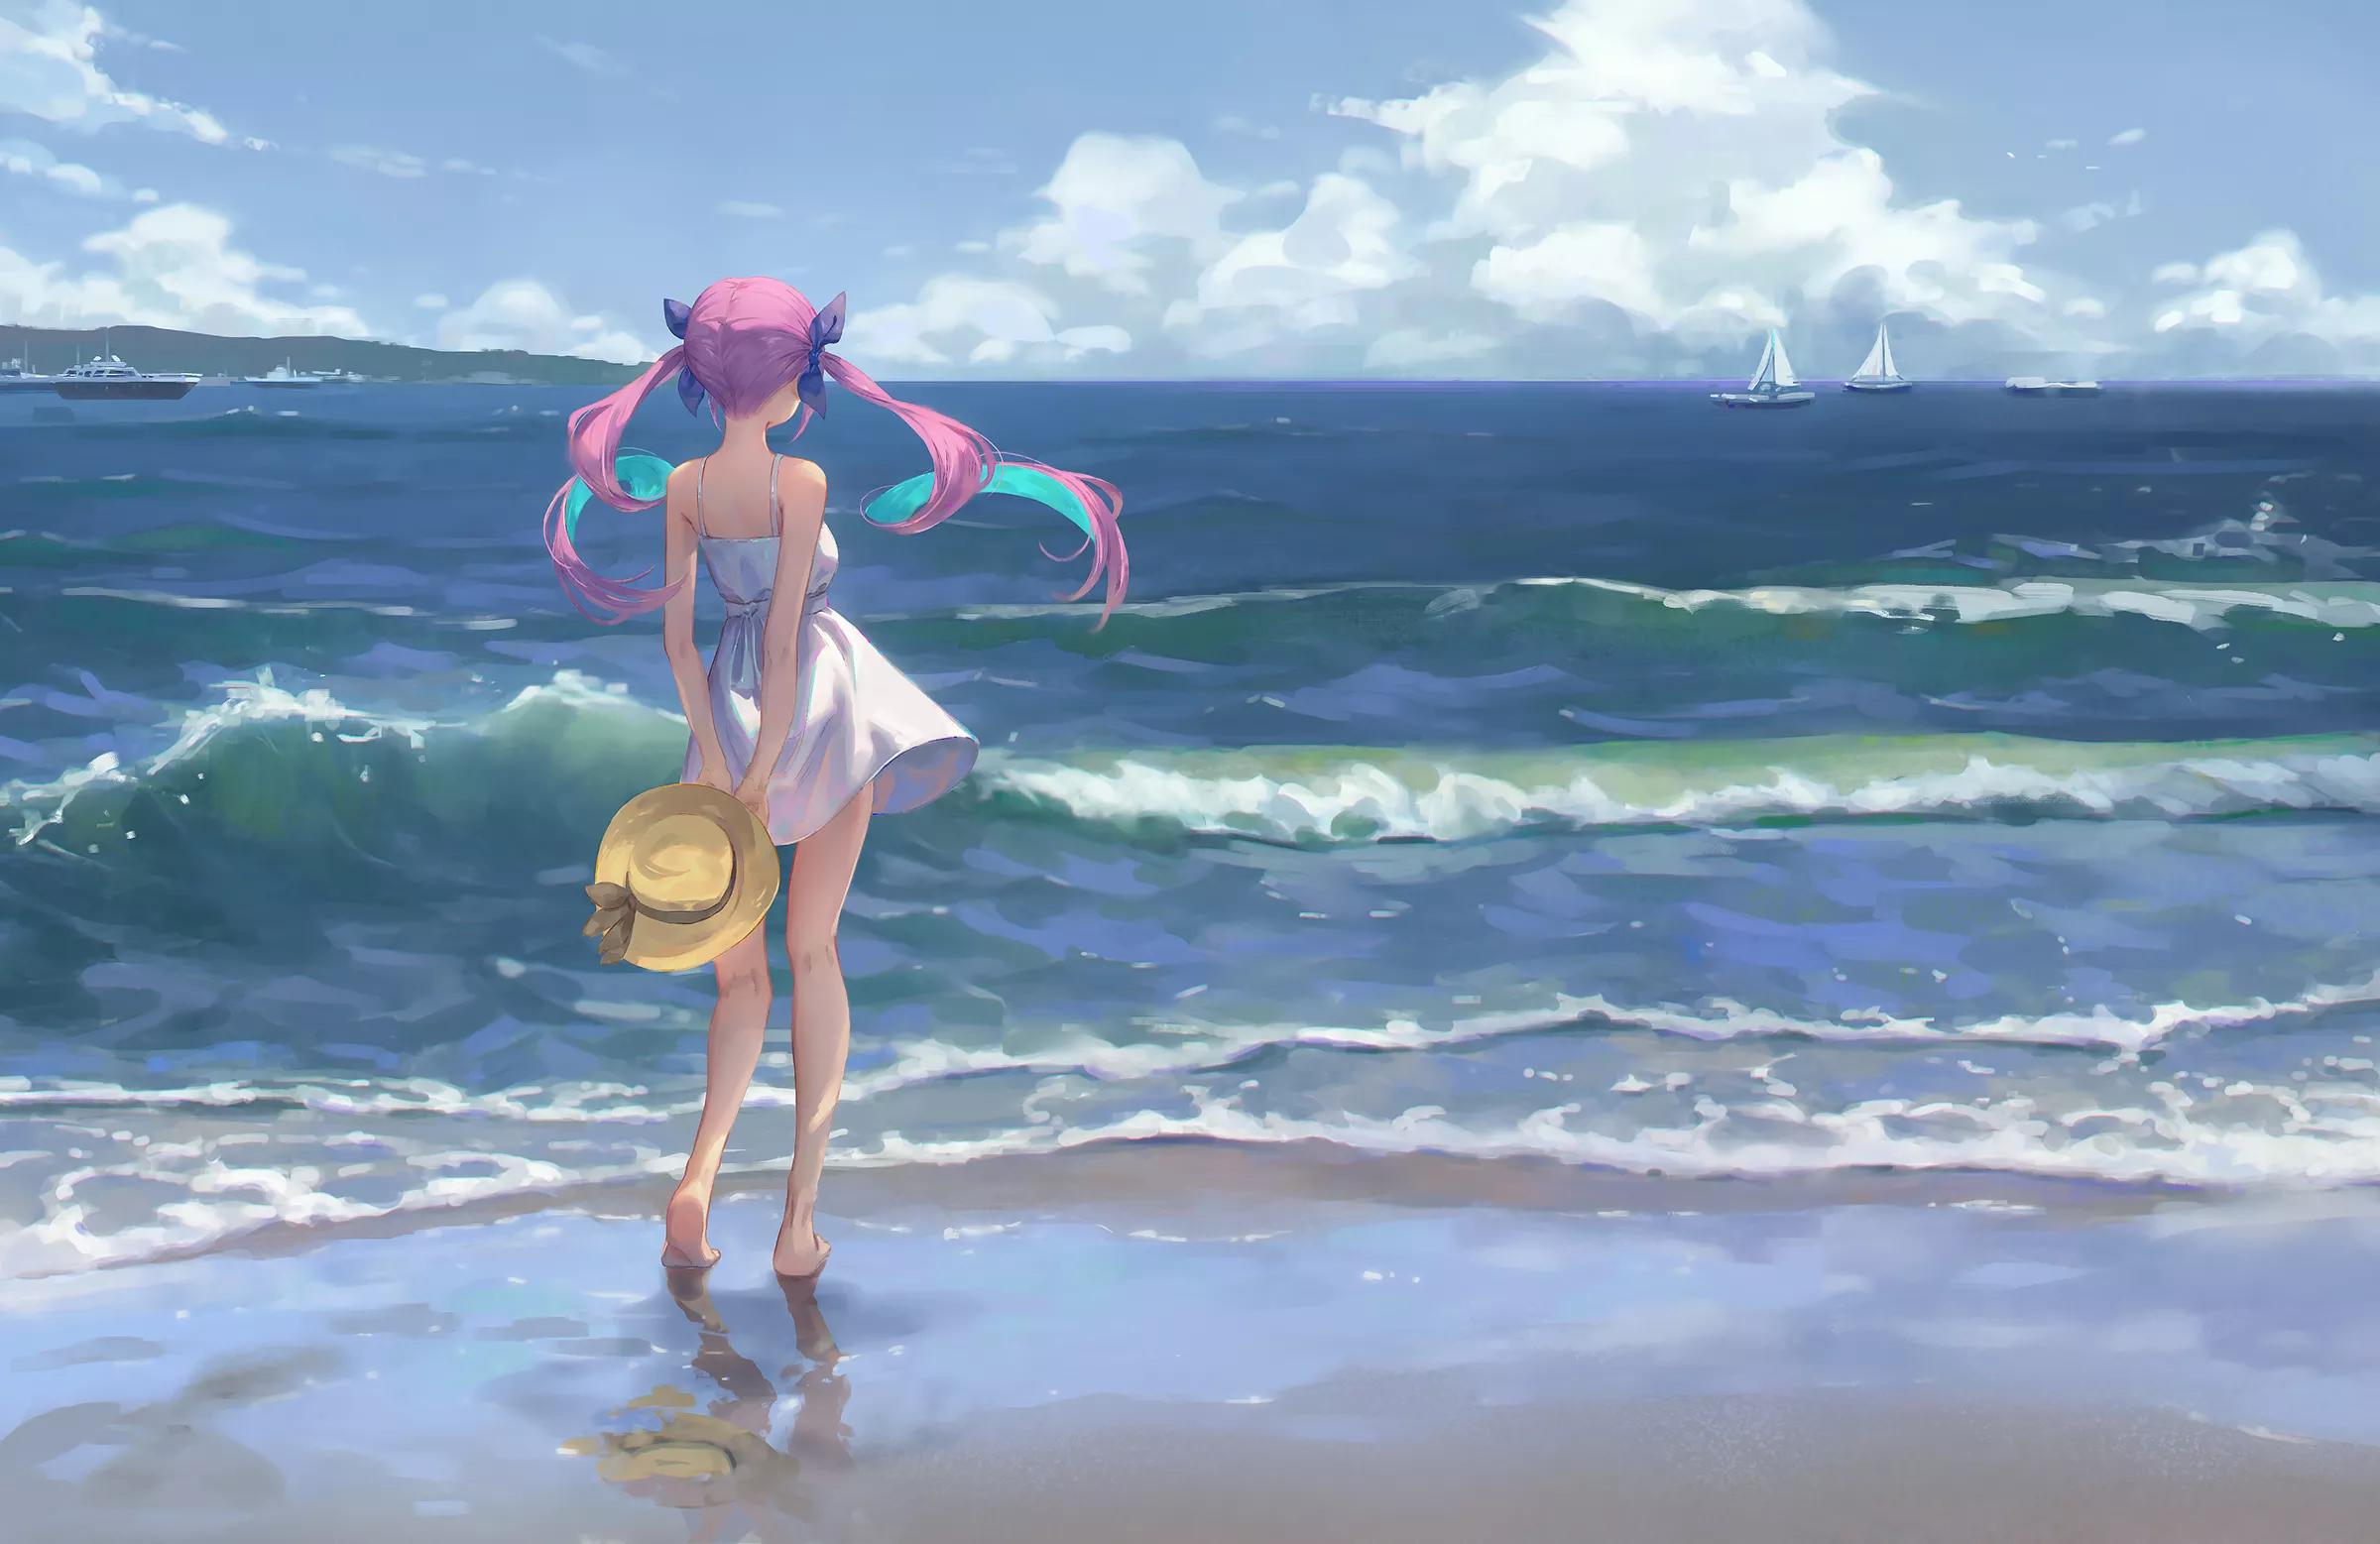 【PIECES.0x01】Shell之外的往事:夏天的风